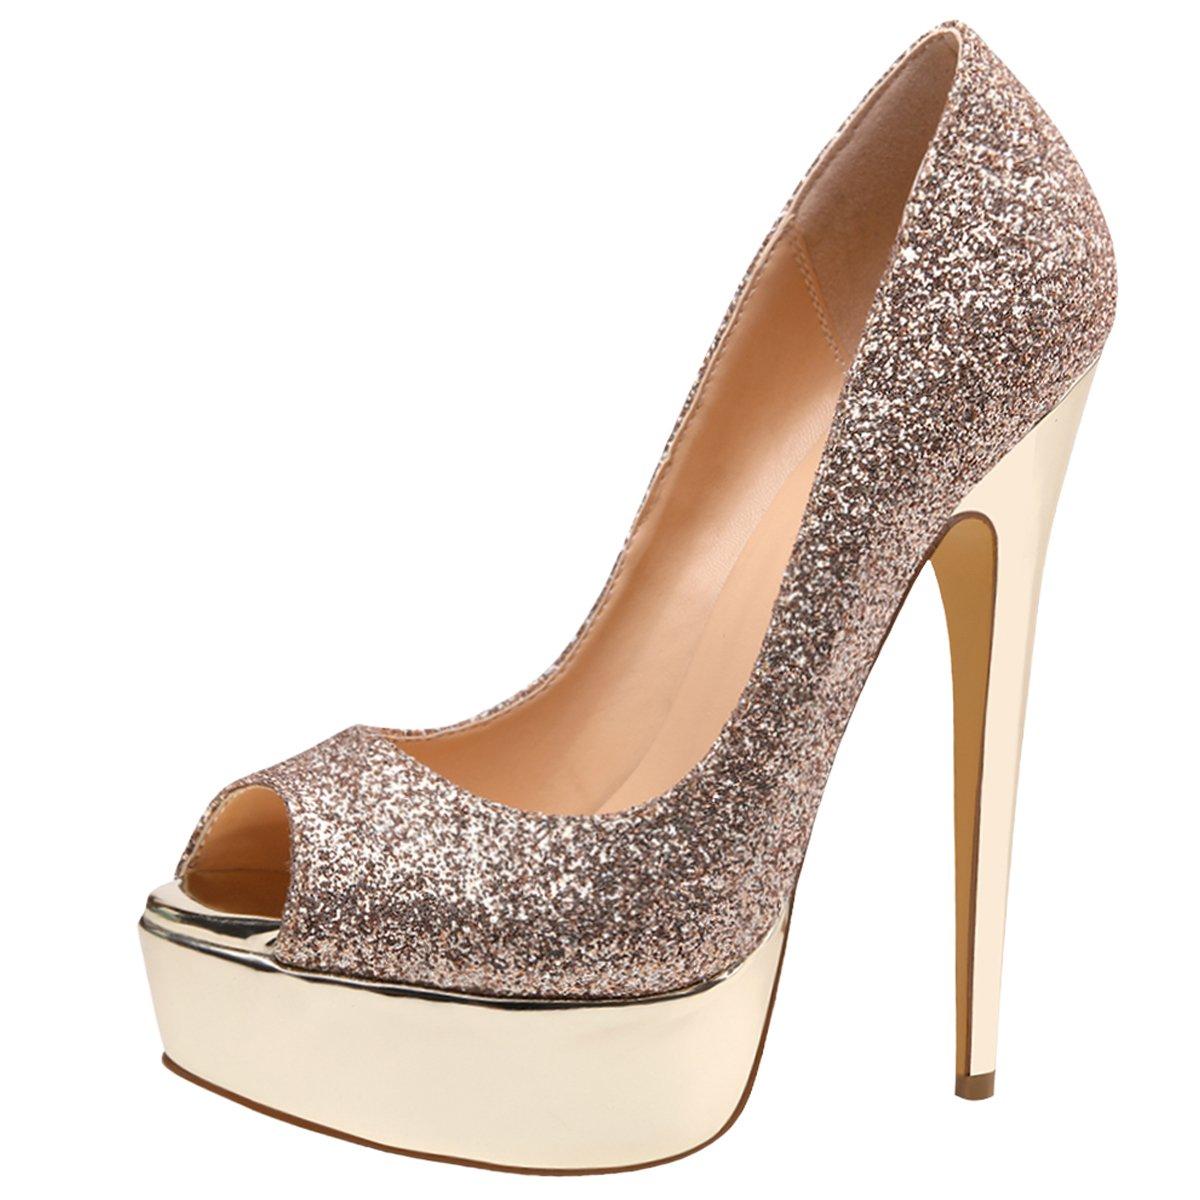 Women's Sexy Gold Glitter Peep Toe High-Heel Platform Pumps - DeluxeAdultCostumes.com